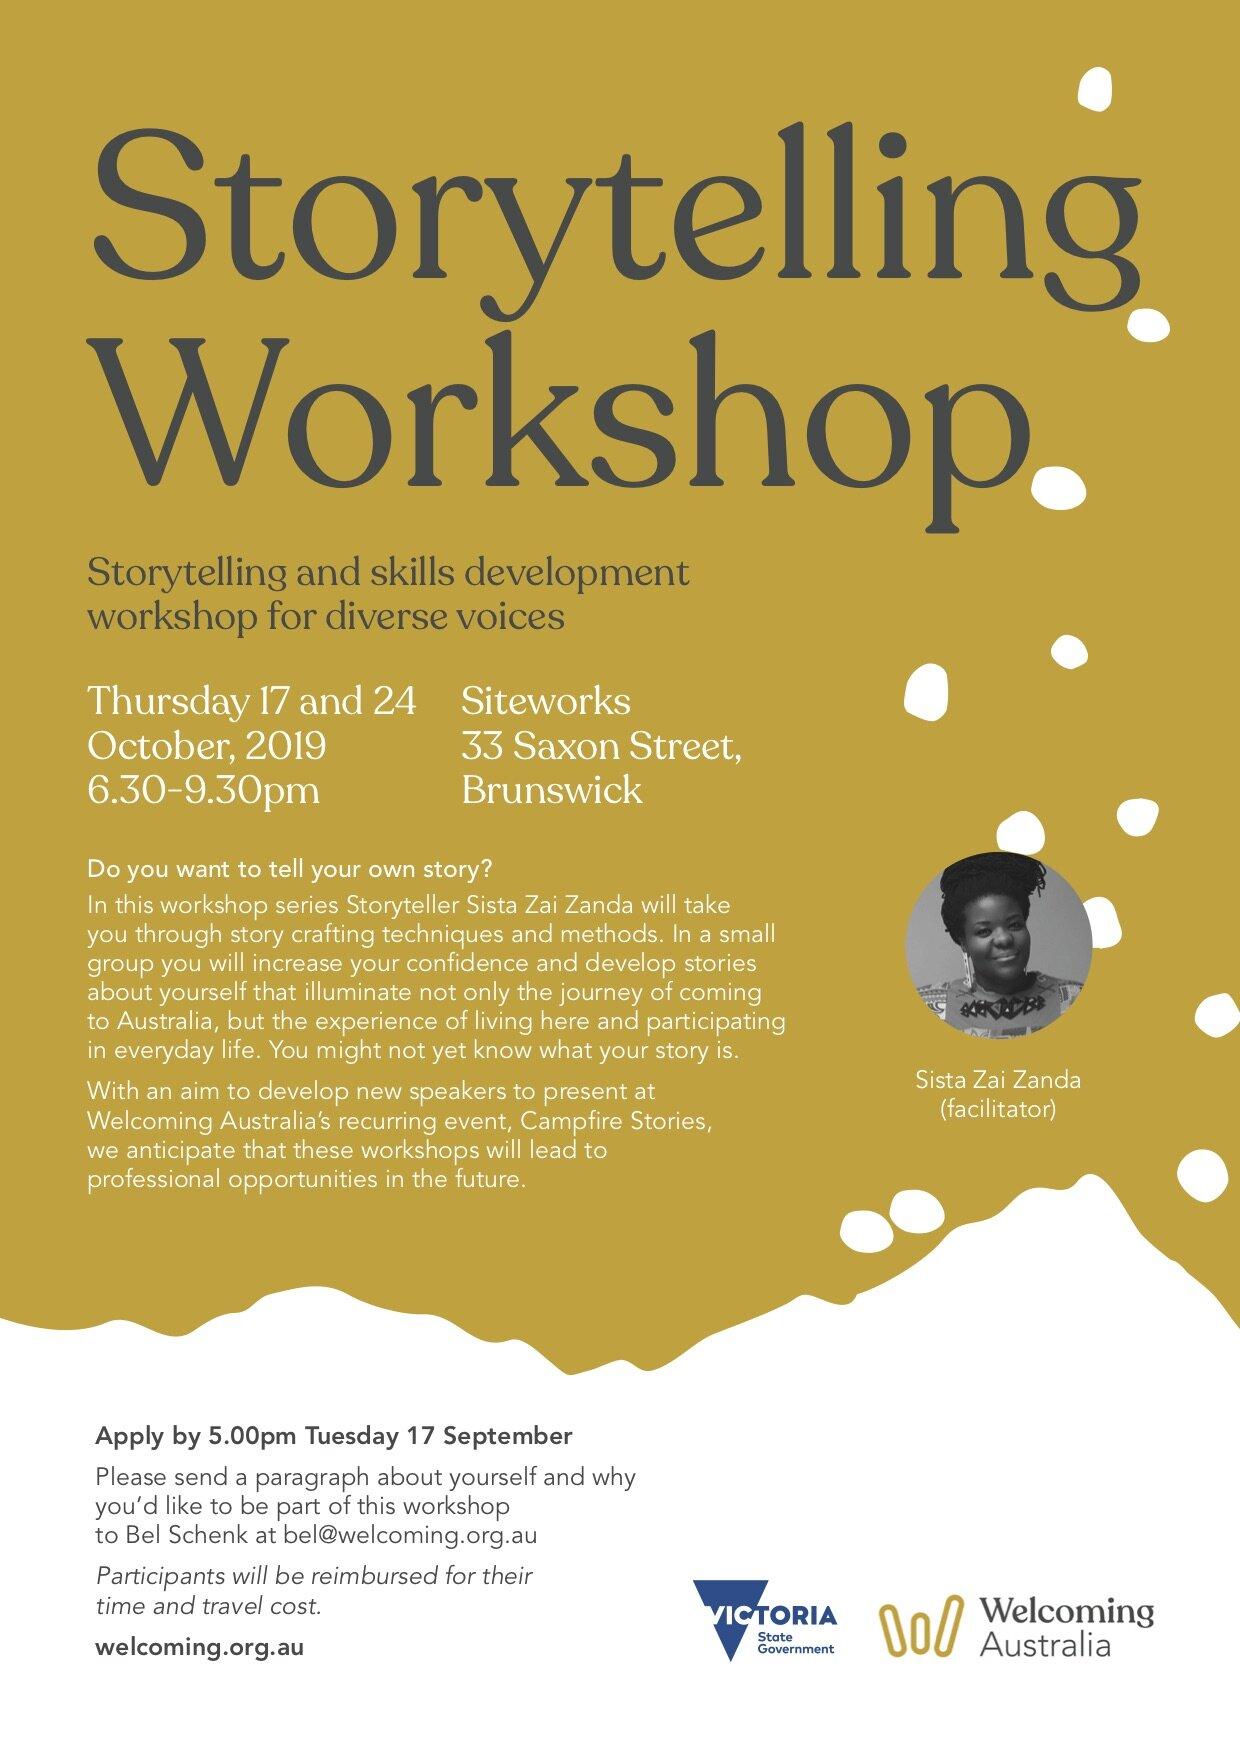 Diverse-Voices-Storytelling-Workshop.jpg